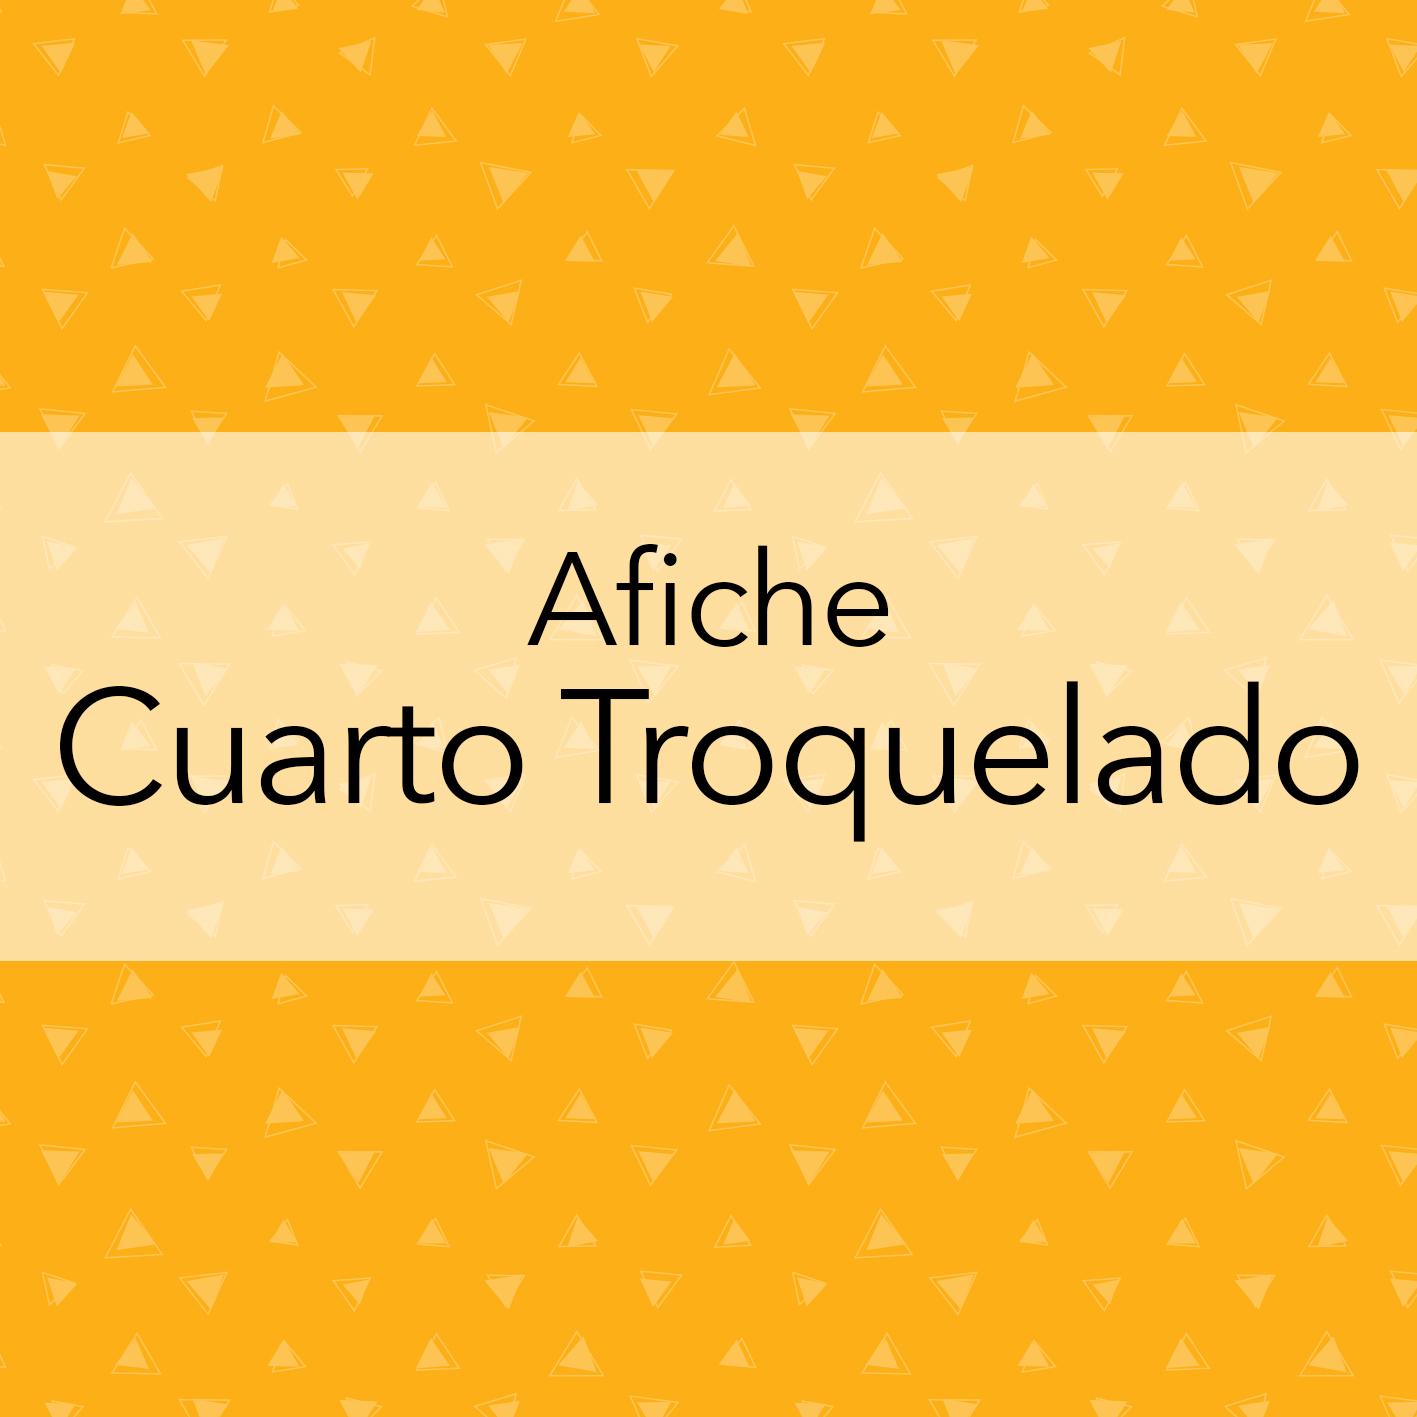 AFICHE CUARTO TROQUELADO